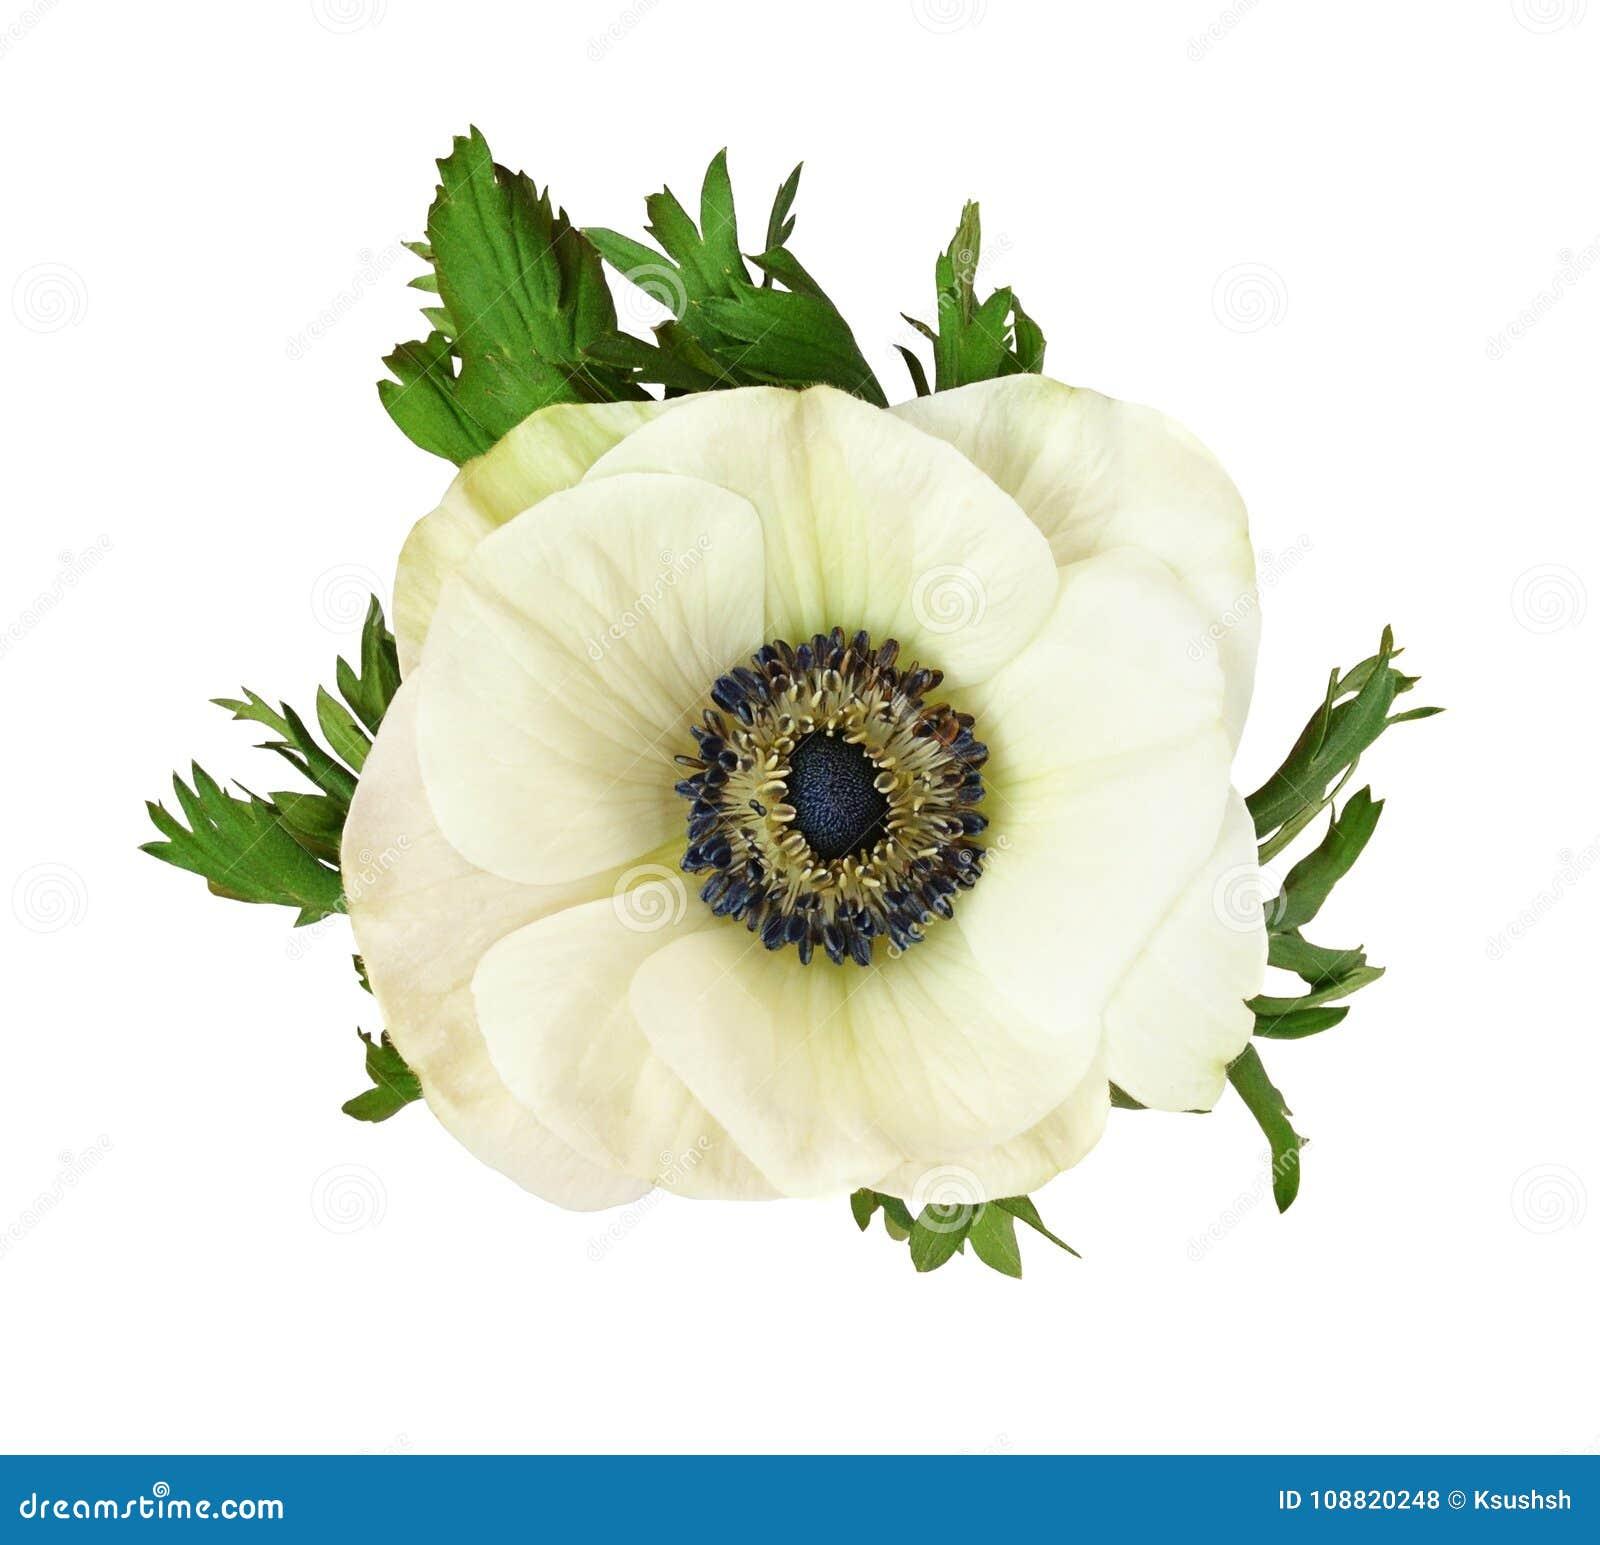 Enchanting wedding flowers meaning illustration the wedding ideas white anemone flower meaning gallery flower decoration ideas mightylinksfo